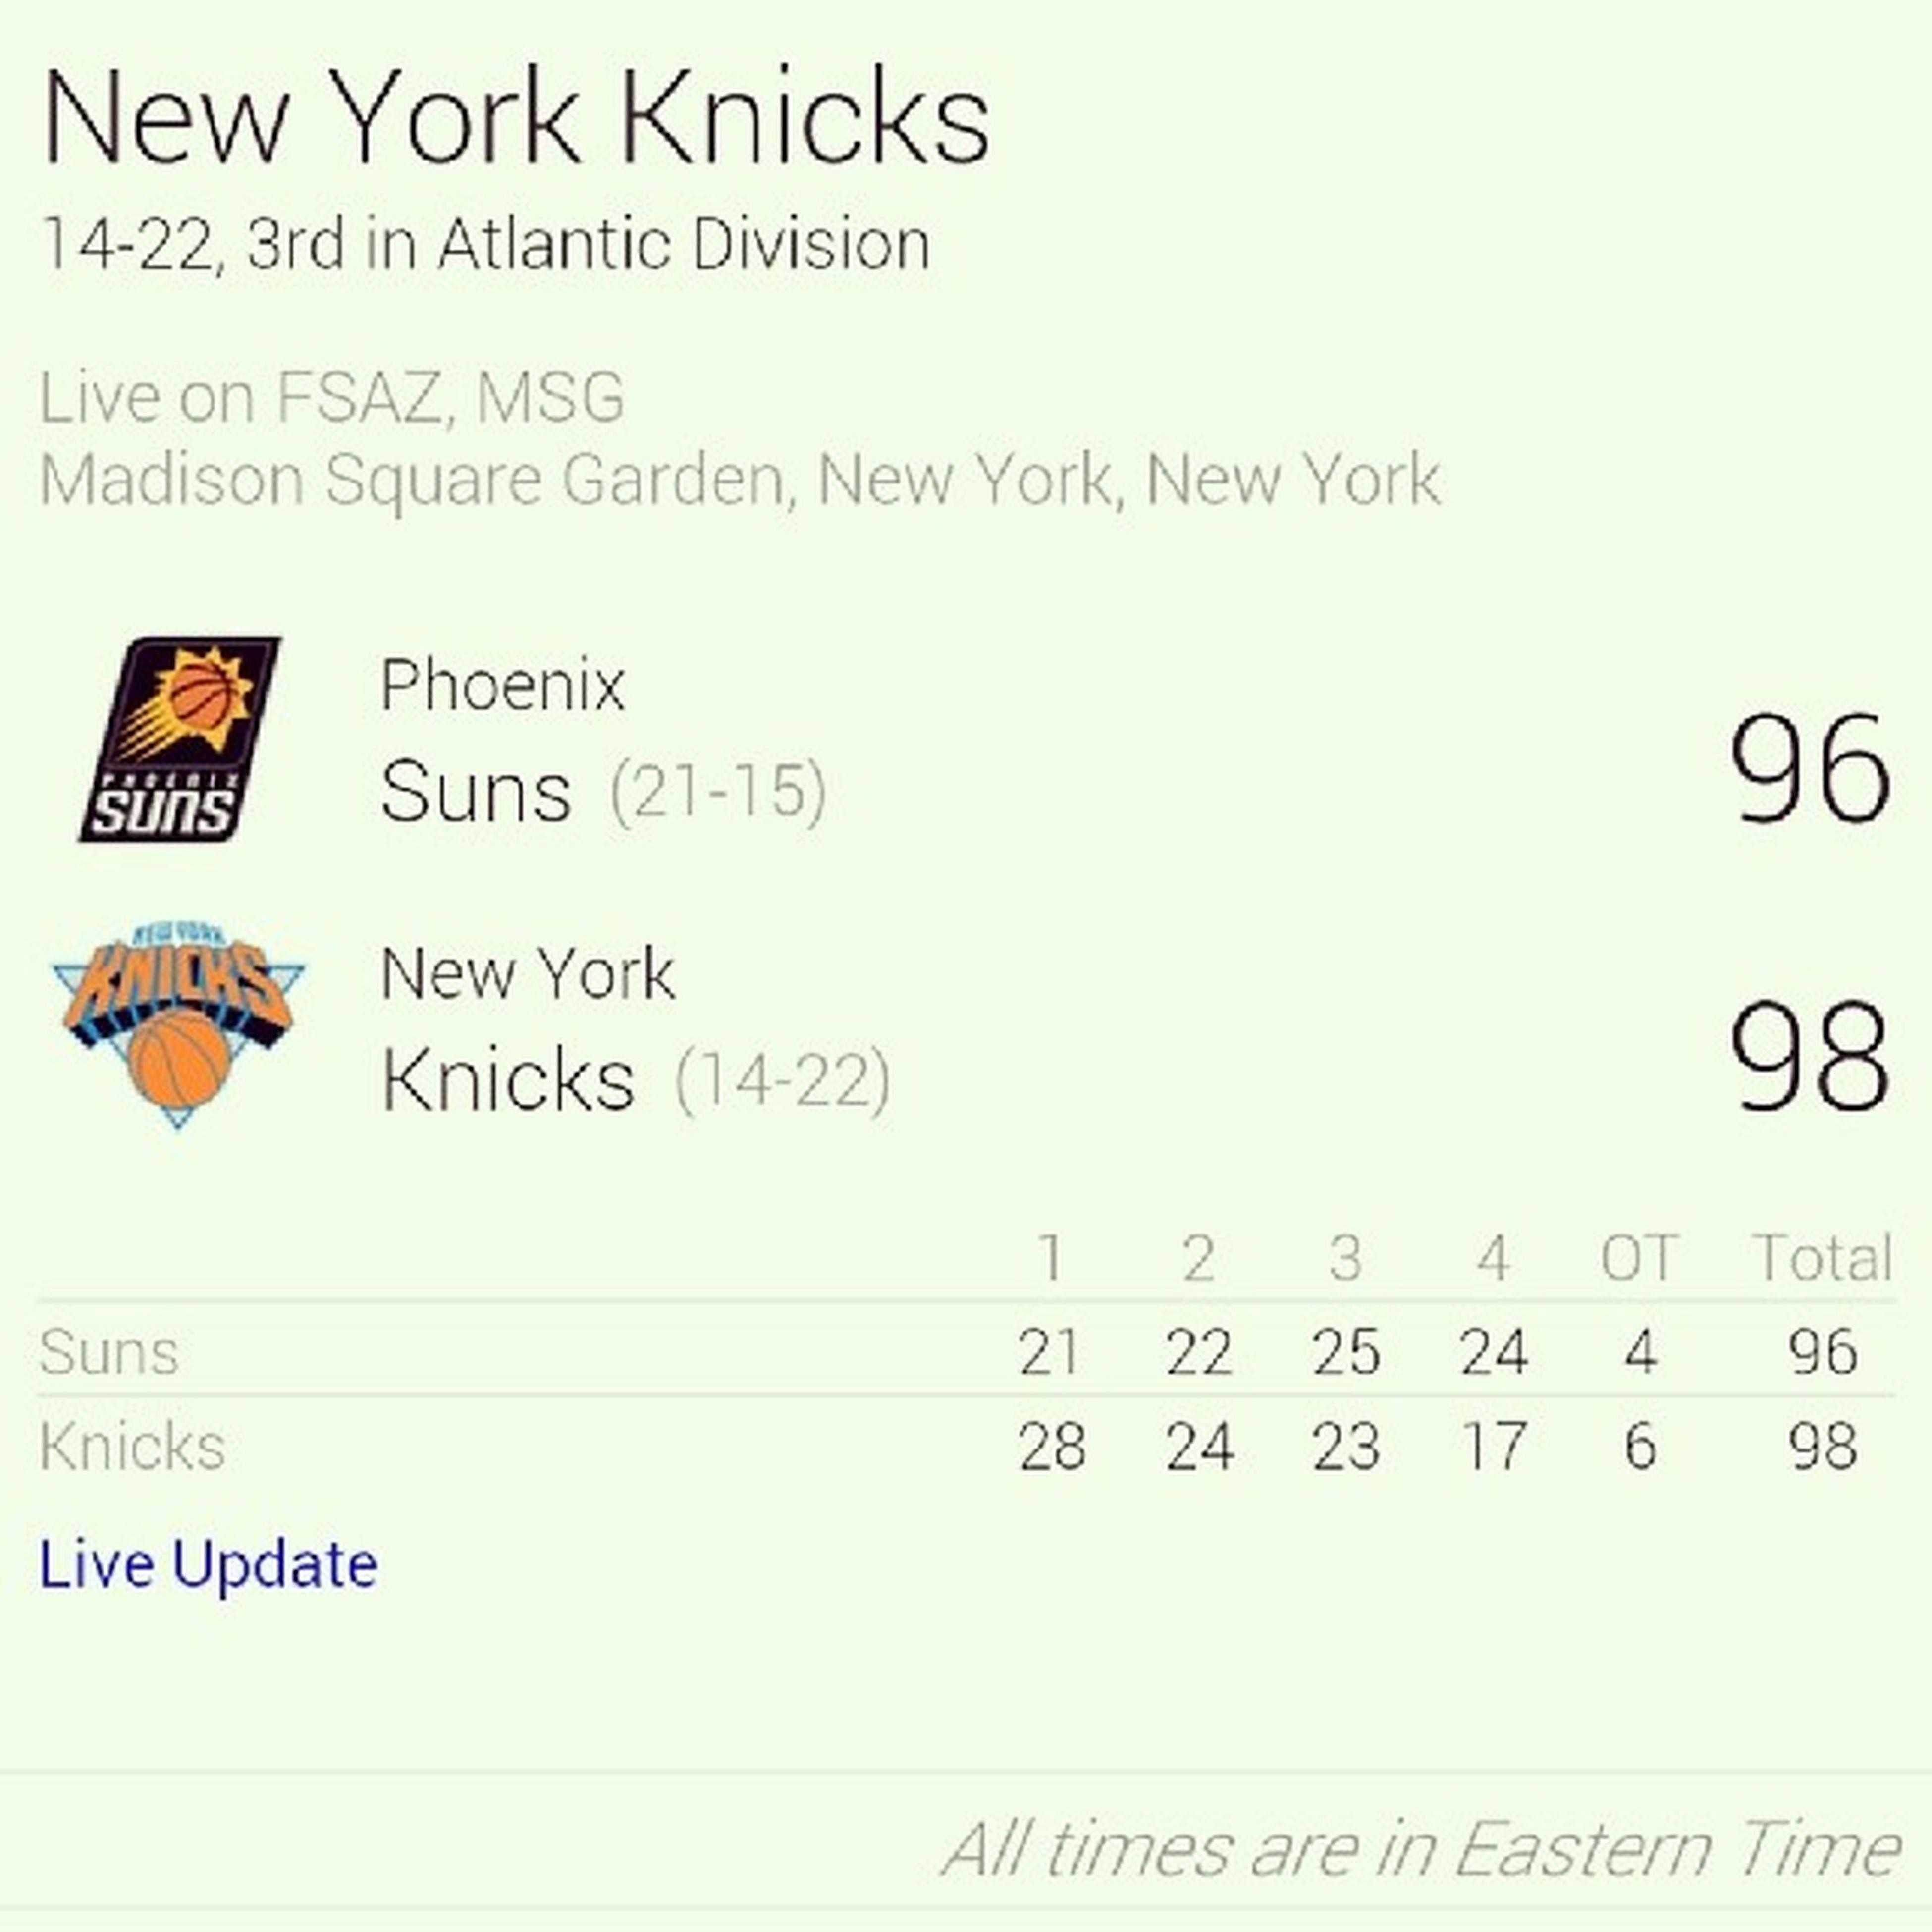 Another WIN for the New York Knicks!!! Carmeloanthony 7 29points 16rebounds 4assists NewYorkKnicks NYK NYAllDay Knickerbockers KnicksFanforLife KnicksFanTilDeath Knickstape WeAintNewToThis WeTrueToThis IBleedOrangeandBlue Letskeepitup letsgoNewYork GoNYGoNYGo hatersgonnahate NYKAllDay winnerwinnerchickendinner fiveinarow howyoulikemenow effthehaters effthebs werepresentNY WeWon @djshameer1